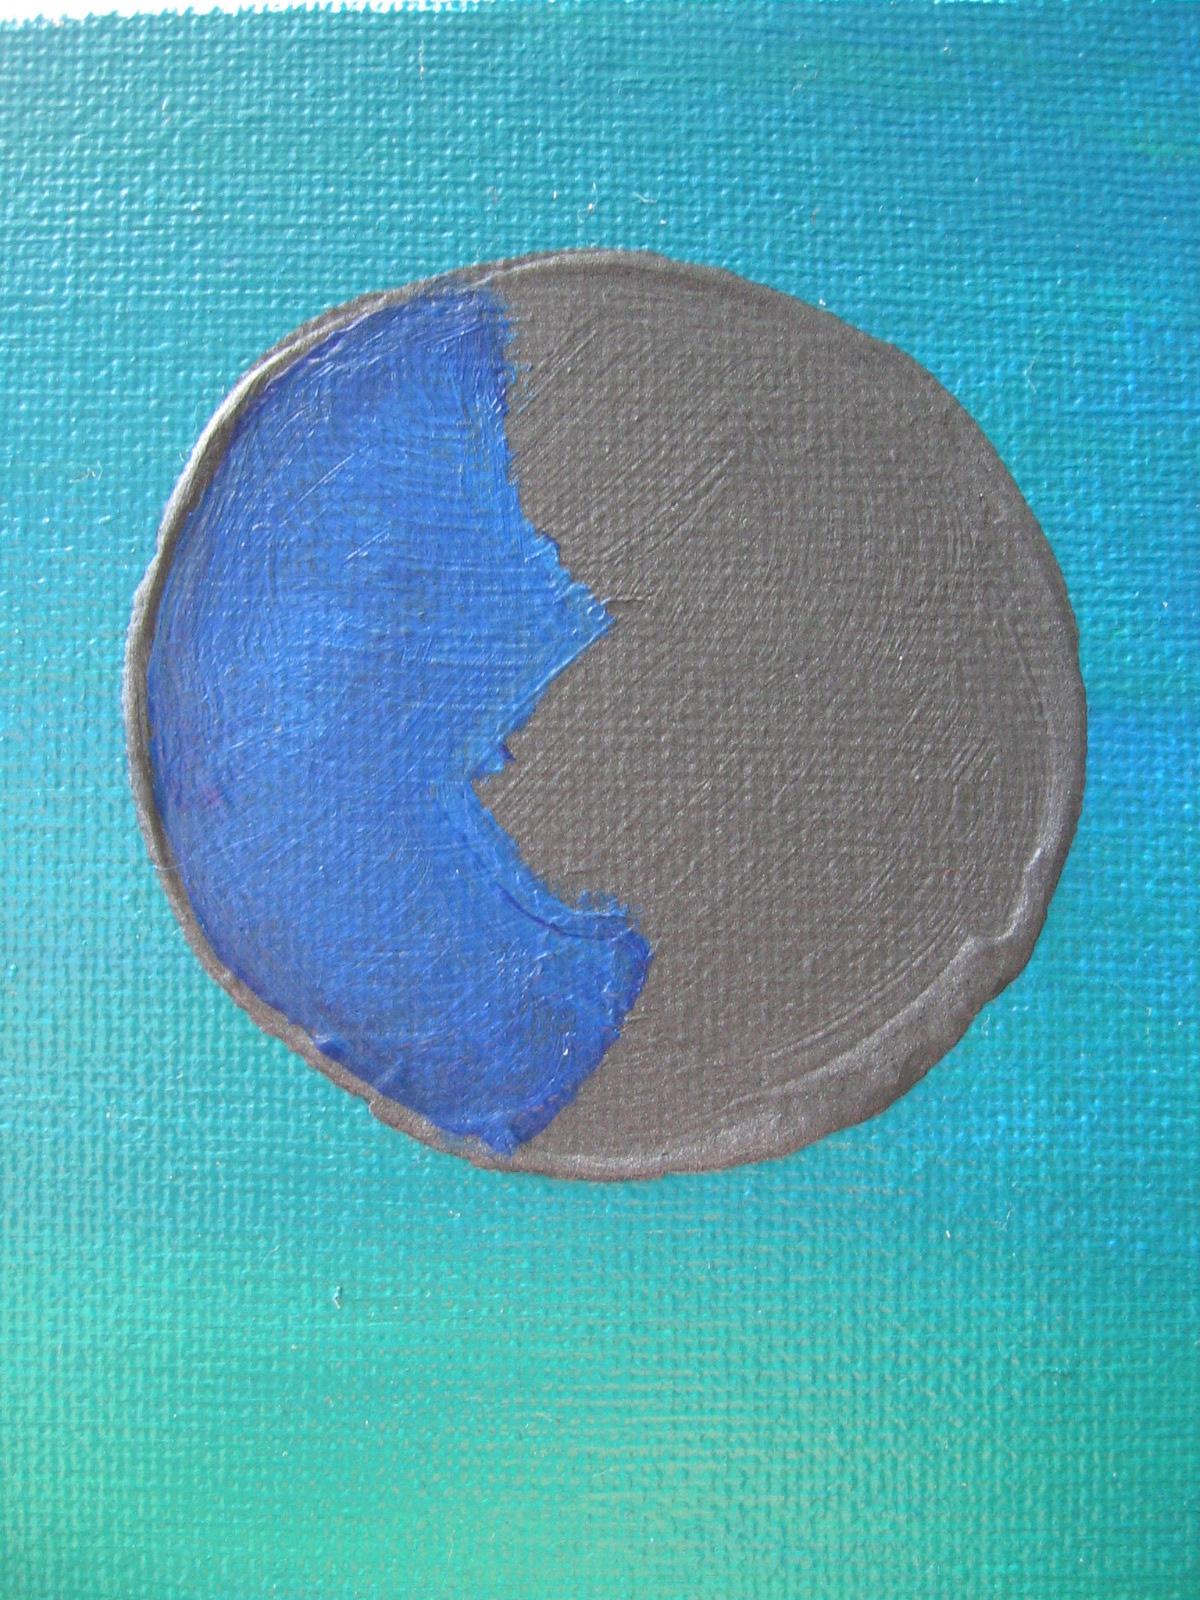 Niechciana 20x20 cm, 300 DKK, 2011